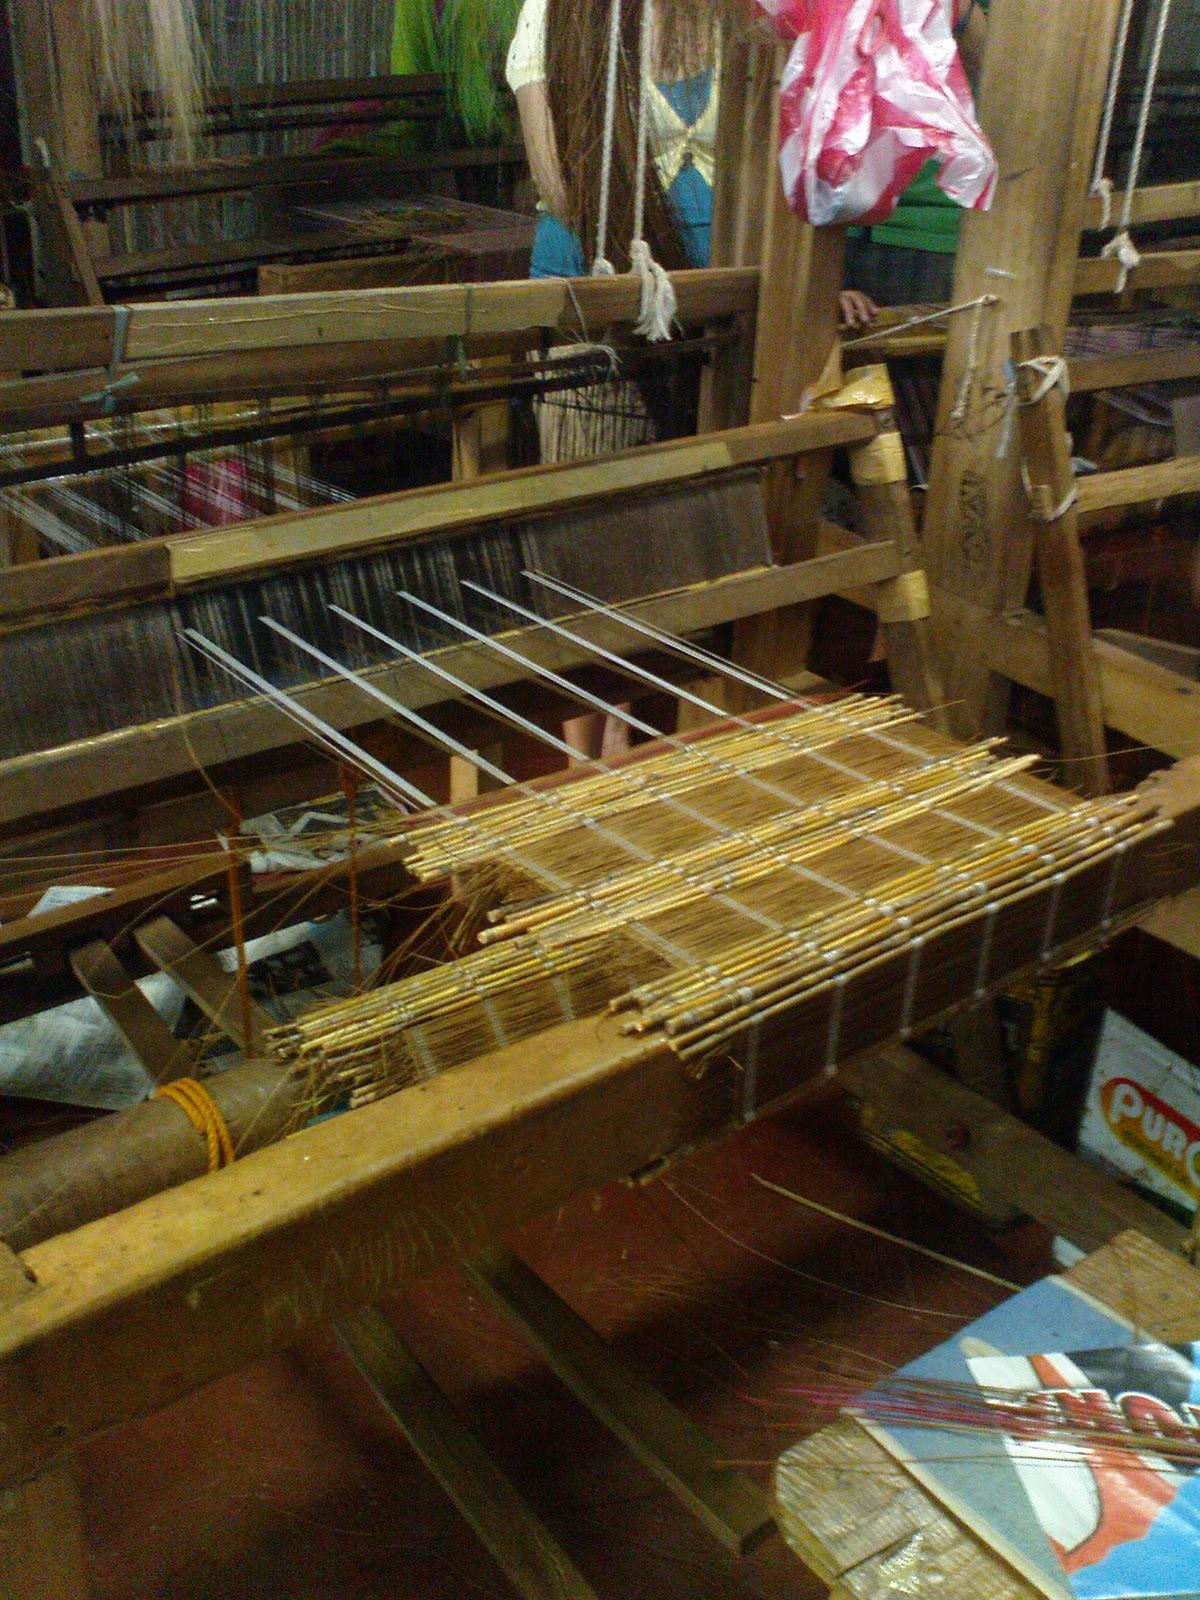 Vacation Checklist Binuatan Weaving Creations And